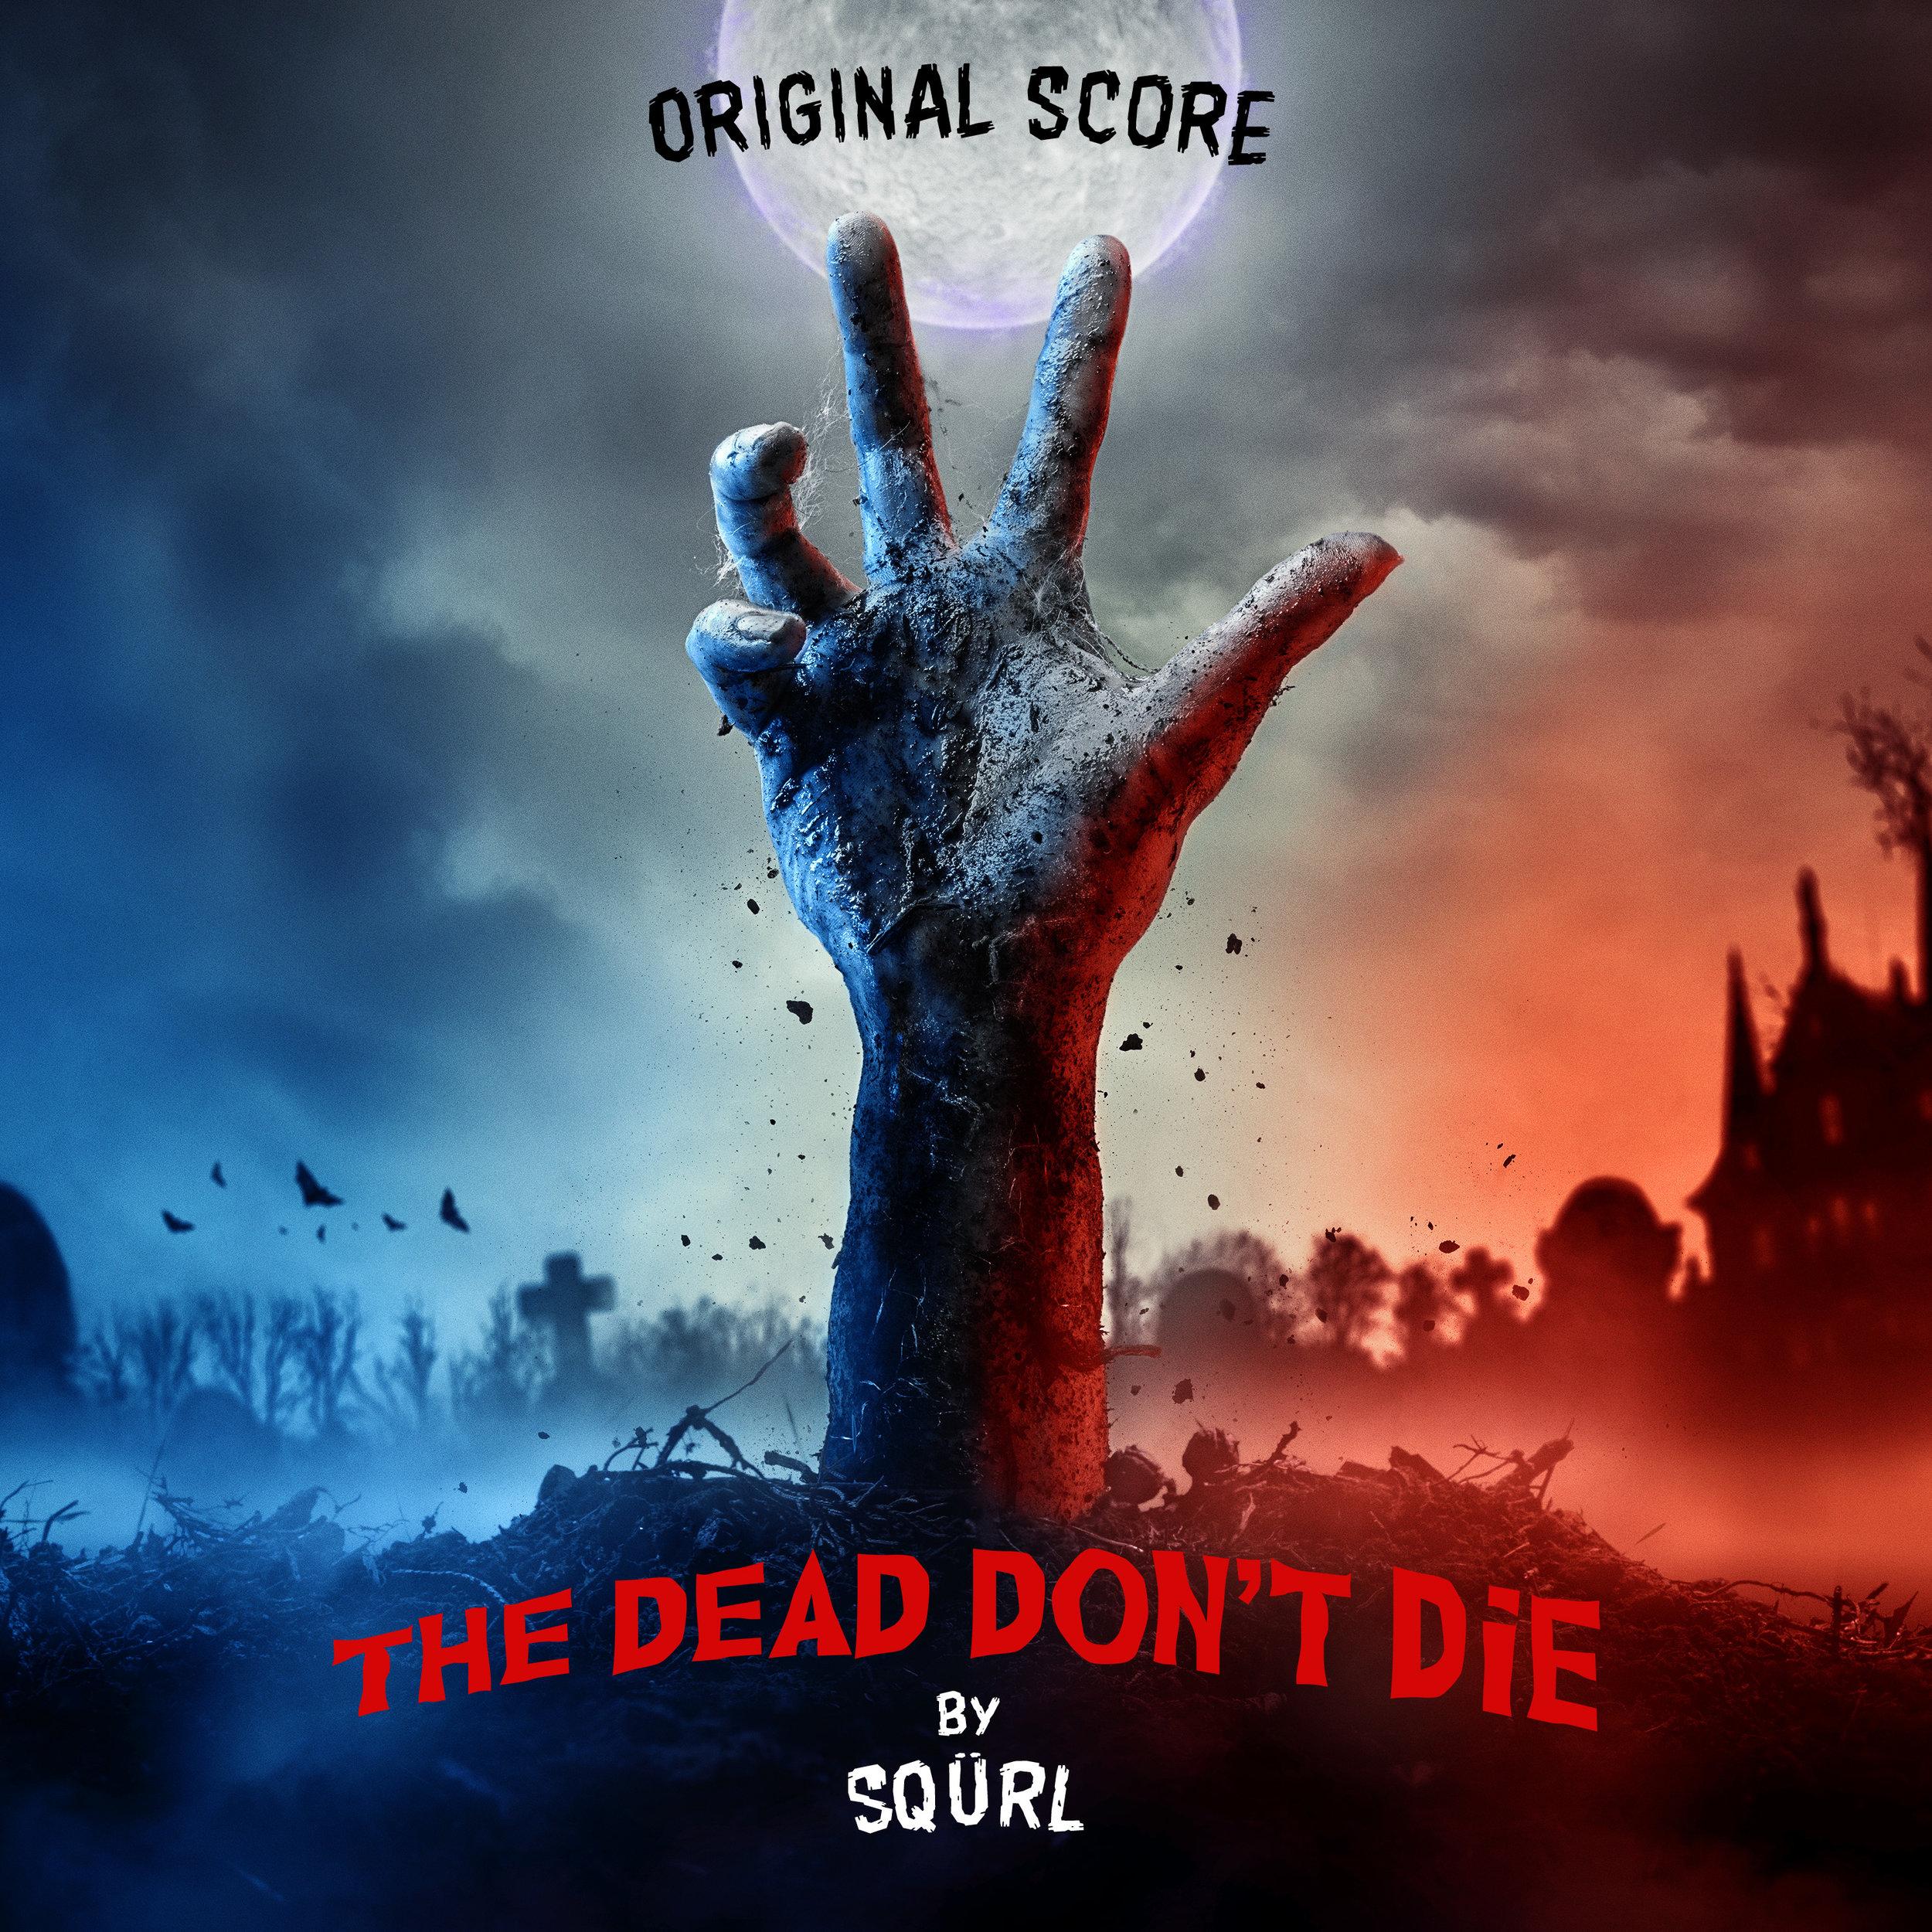 SQÜRL - The Dead Don't Die (Original Score)  Release Date: 6/14/19 Devices Used:  Dispatch Master  /  Transmisser  /  Spires  /  Aqueduct  /  Rainbow Machine  /  Space Spiral